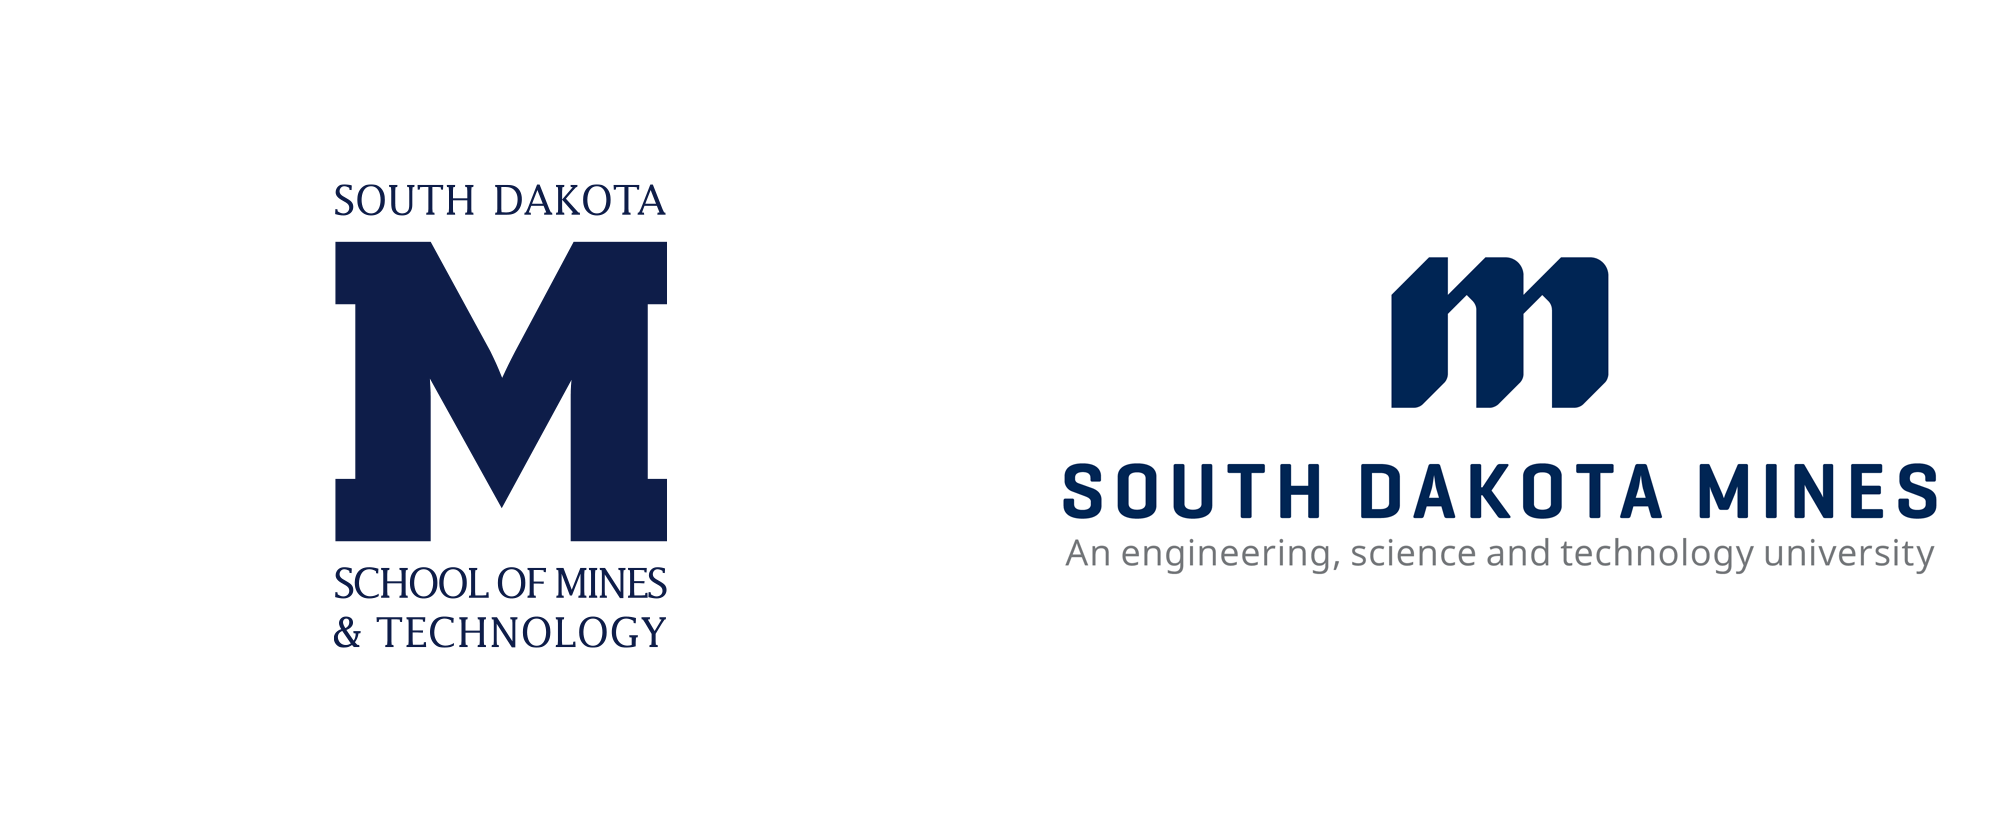 New Name and Logo for South Dakota Mines